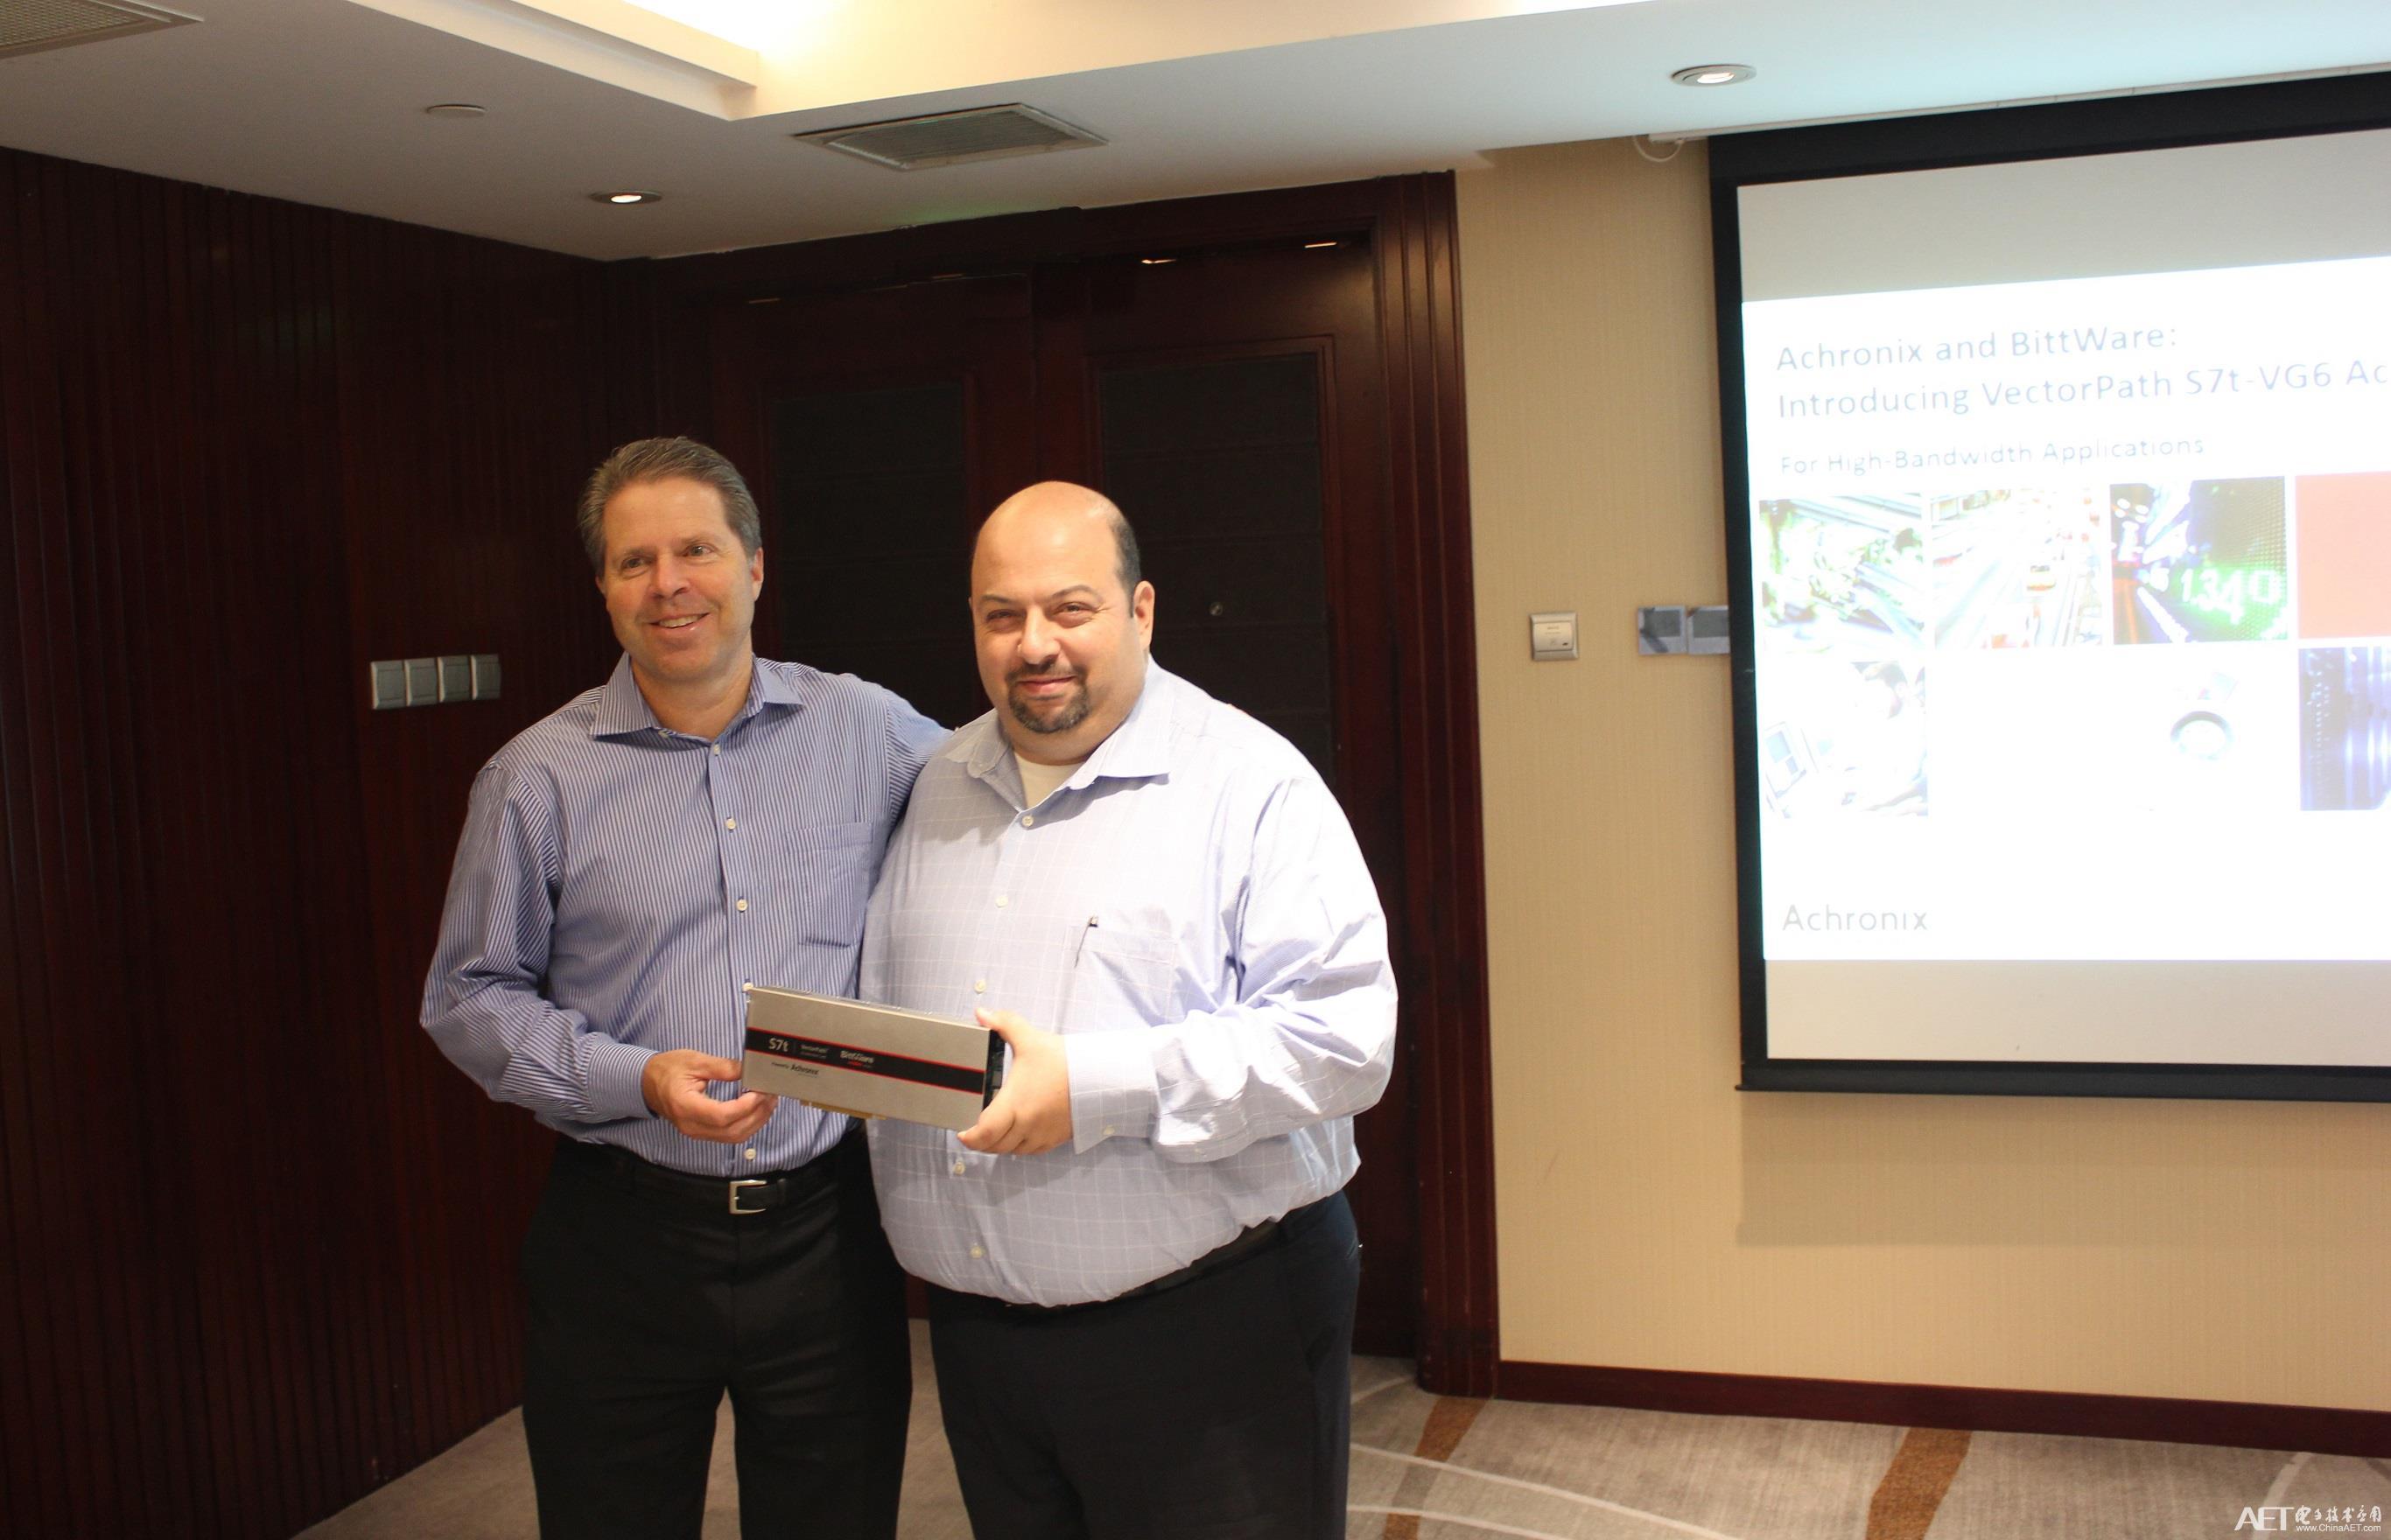 Steve Mensor和Sam Bichara展示采用Speedster7t FPGA芯片的VectorPath加速卡.JPG